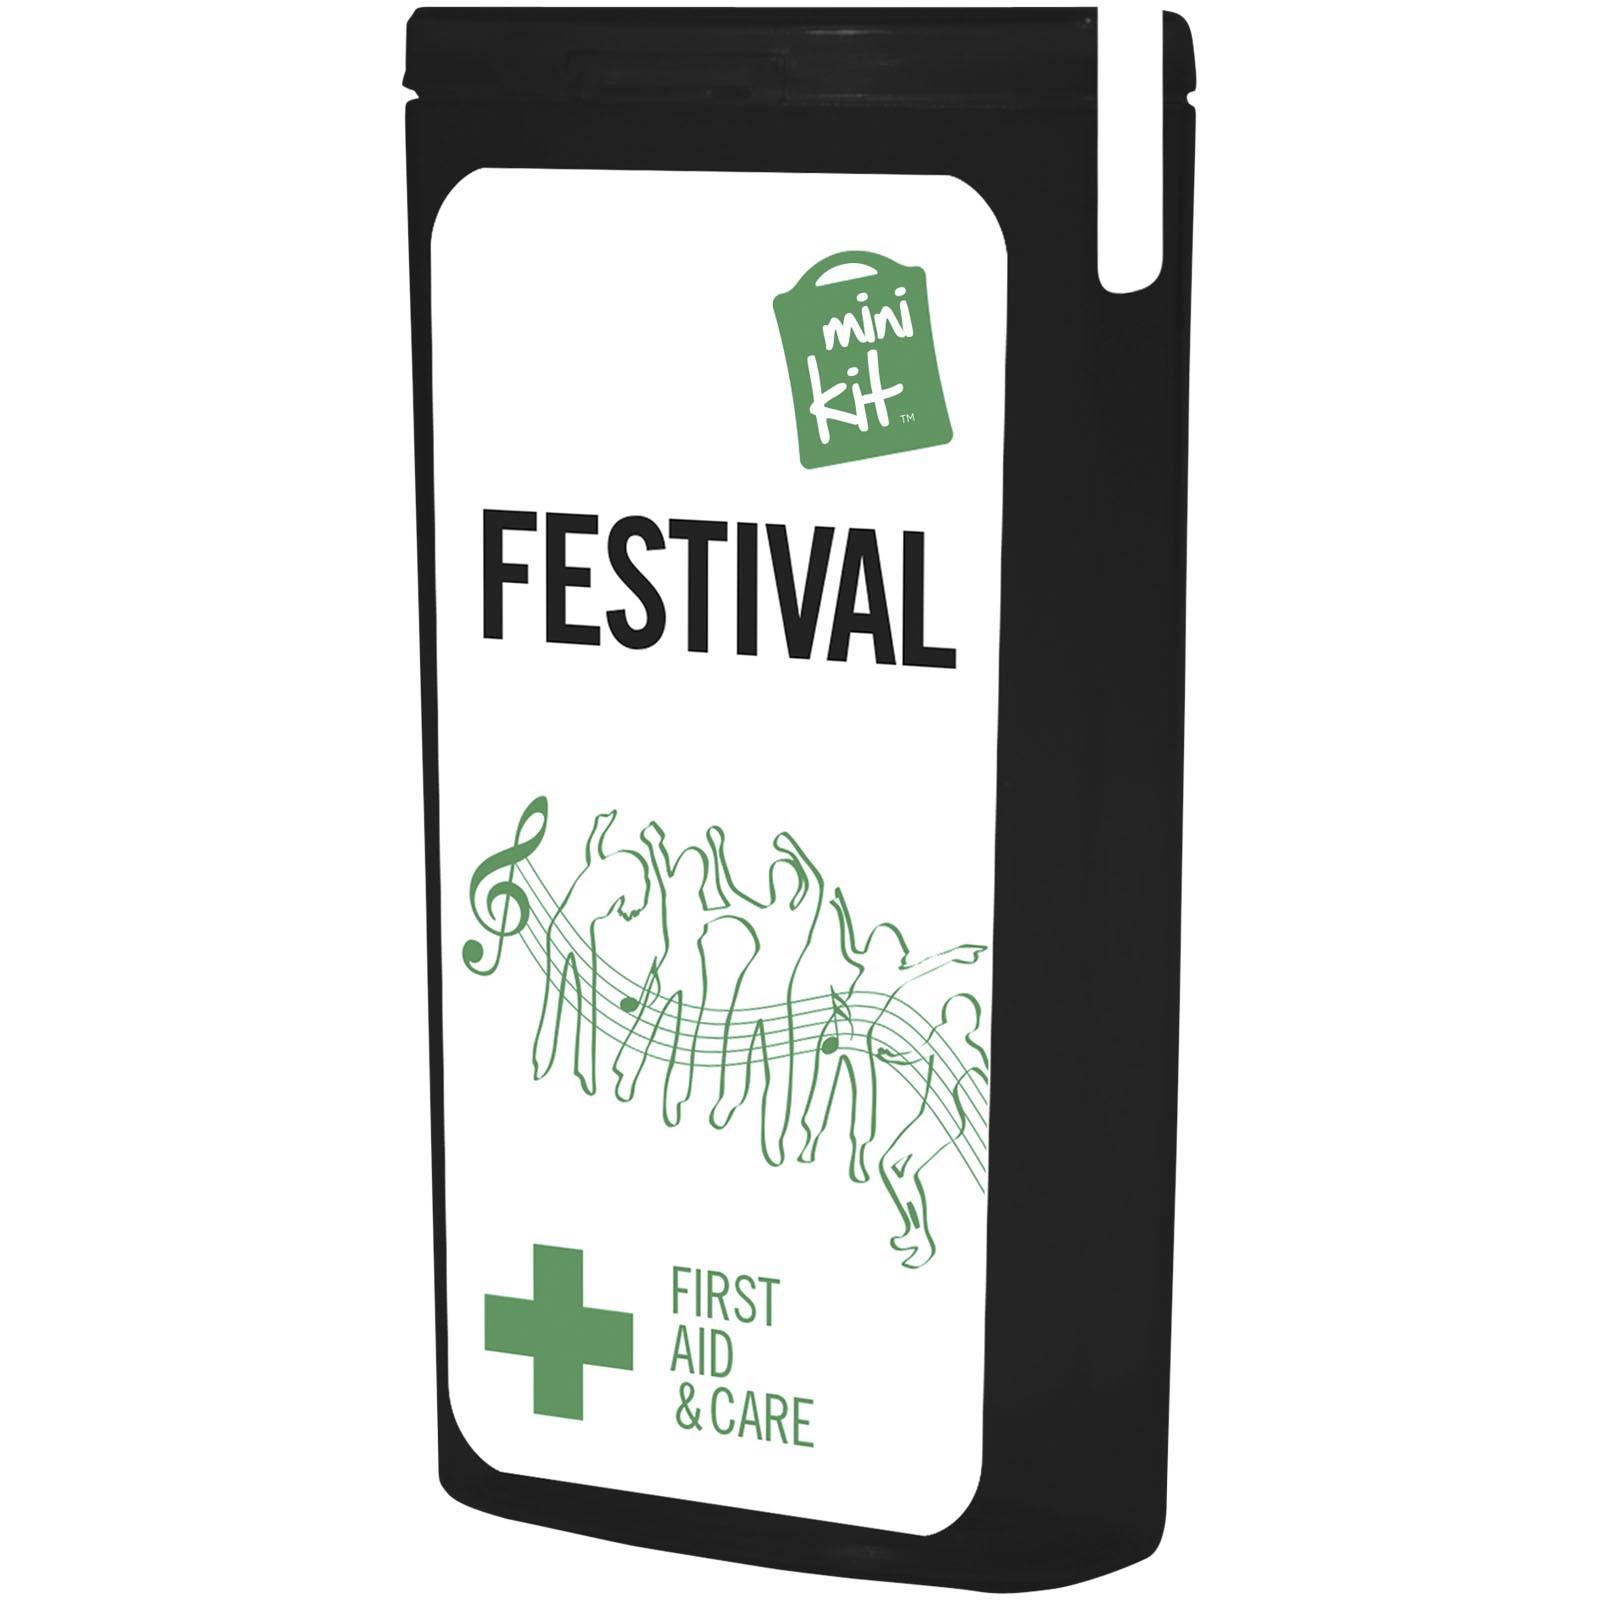 MiniKit Festival Set - Solid Black